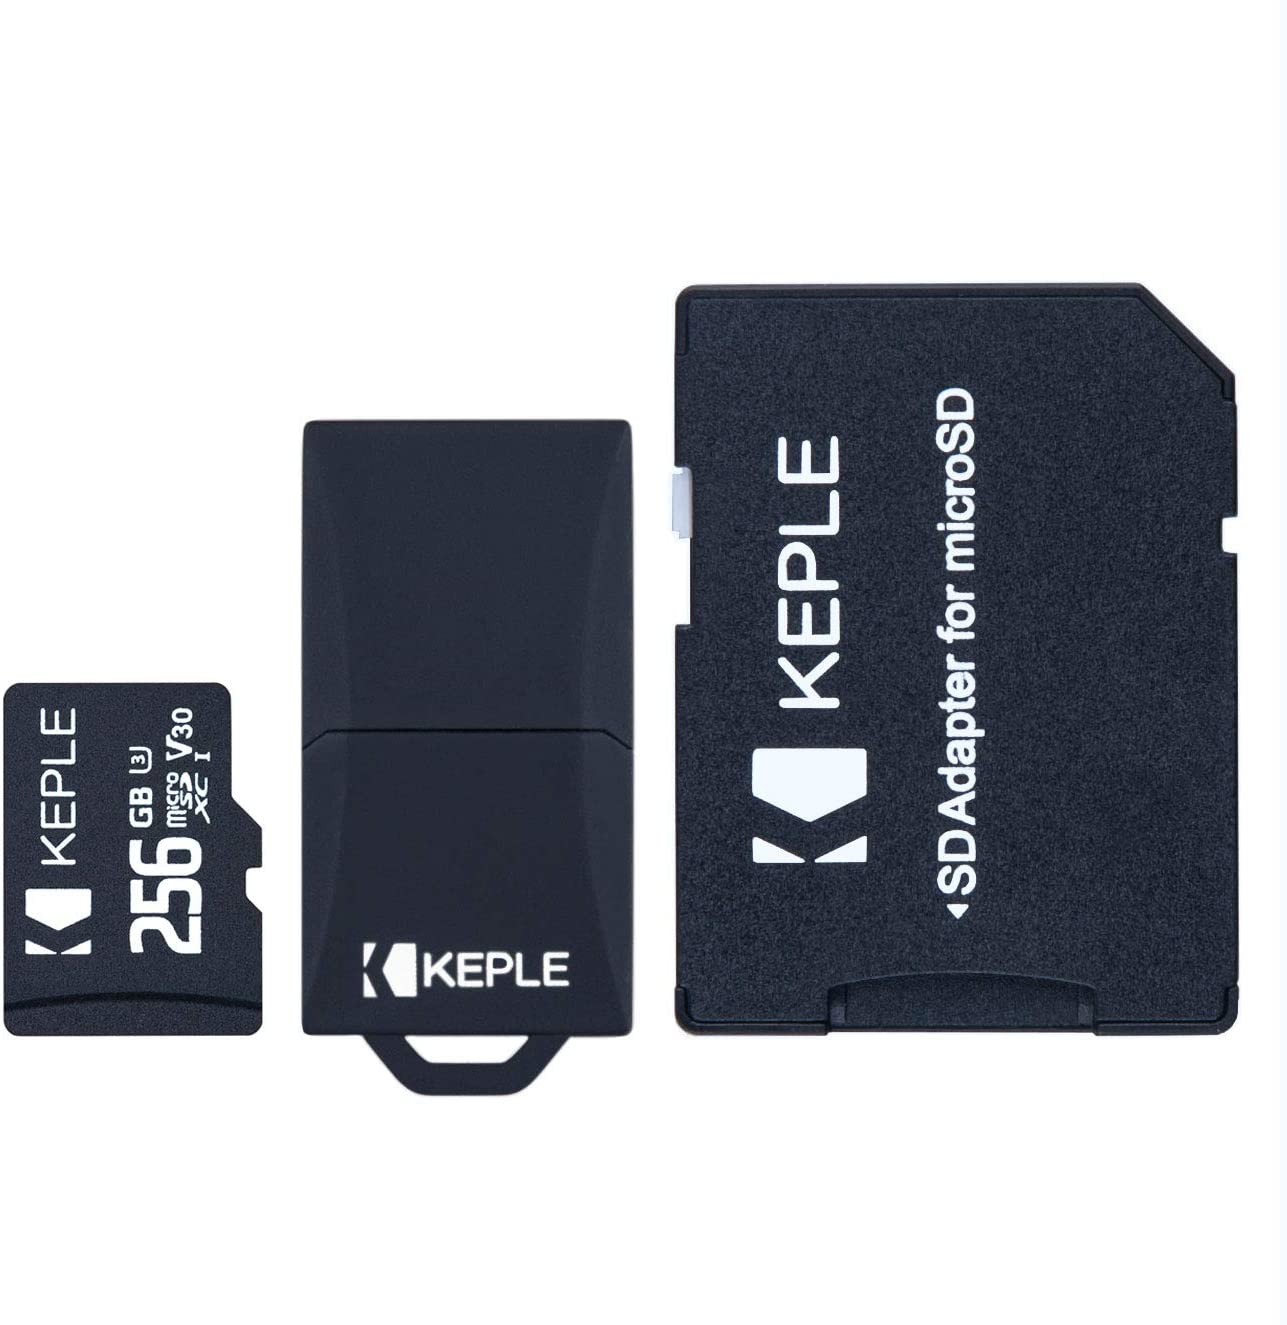 256GB microSD Memory Card Micro SD Compatible with Huawei P8, Lite, P9, P10, Lite, P20, Pro, Lite, 7X, 7C, 7A, Y3, Y5, Y6, Pro, Y7, Prime, Y9, P Smart, Honor 9, V8, 8 Pro, 6A, Mate 9, Enjoy 6 | 256 GB